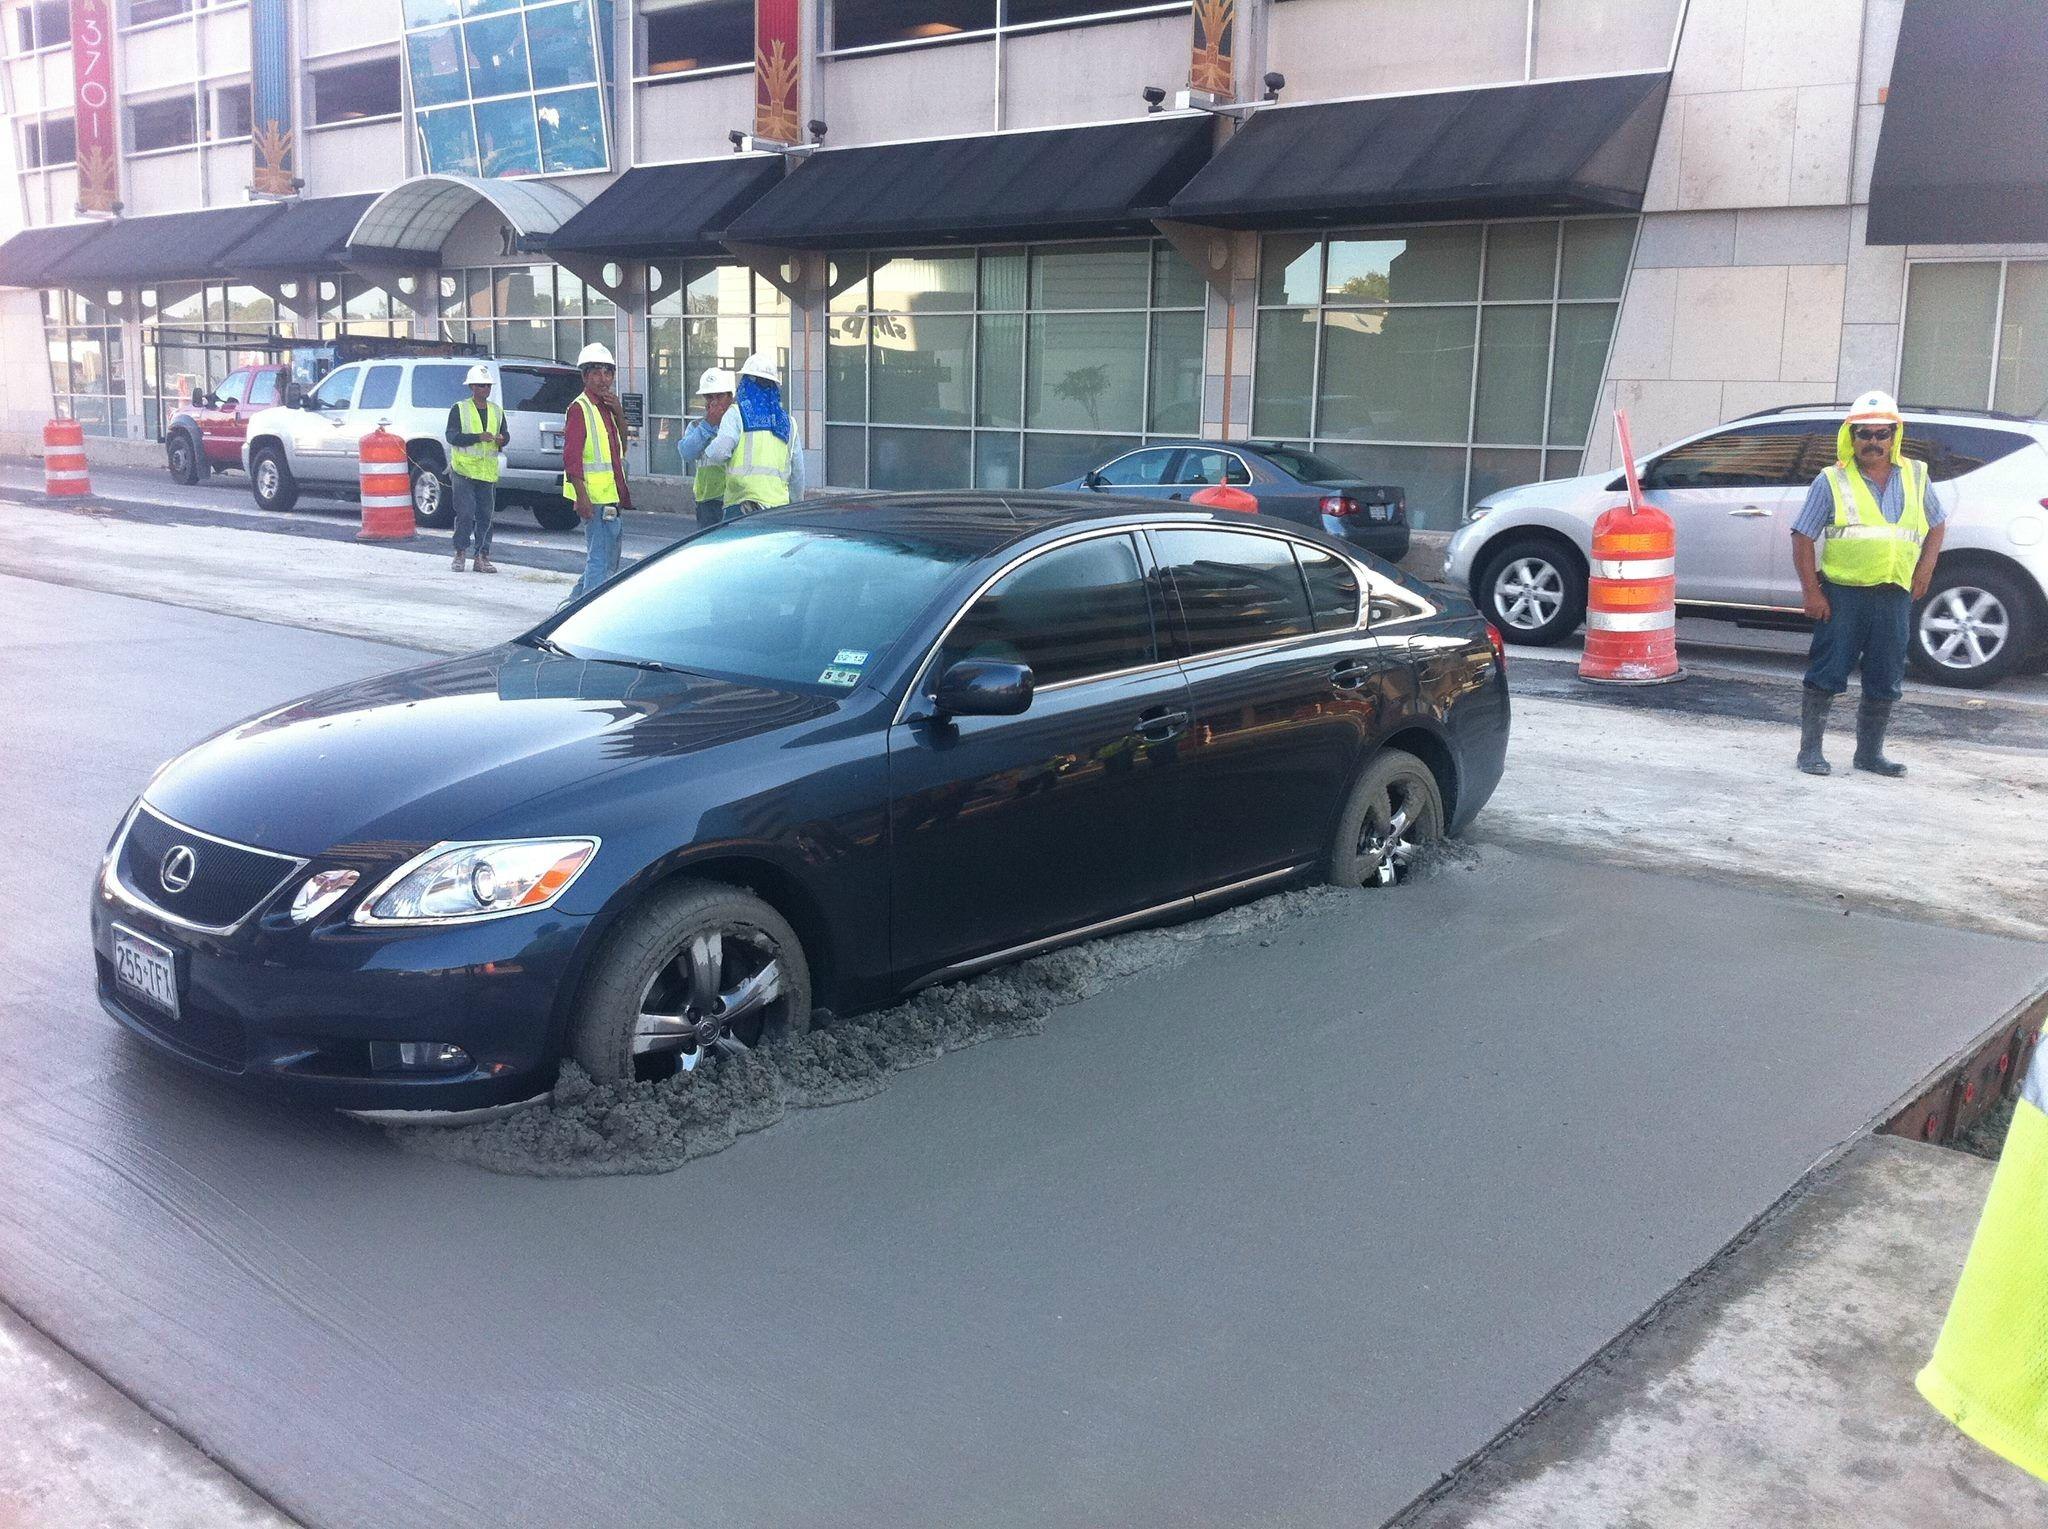 Dumb Drivers That Got Stuck In Wet Cement